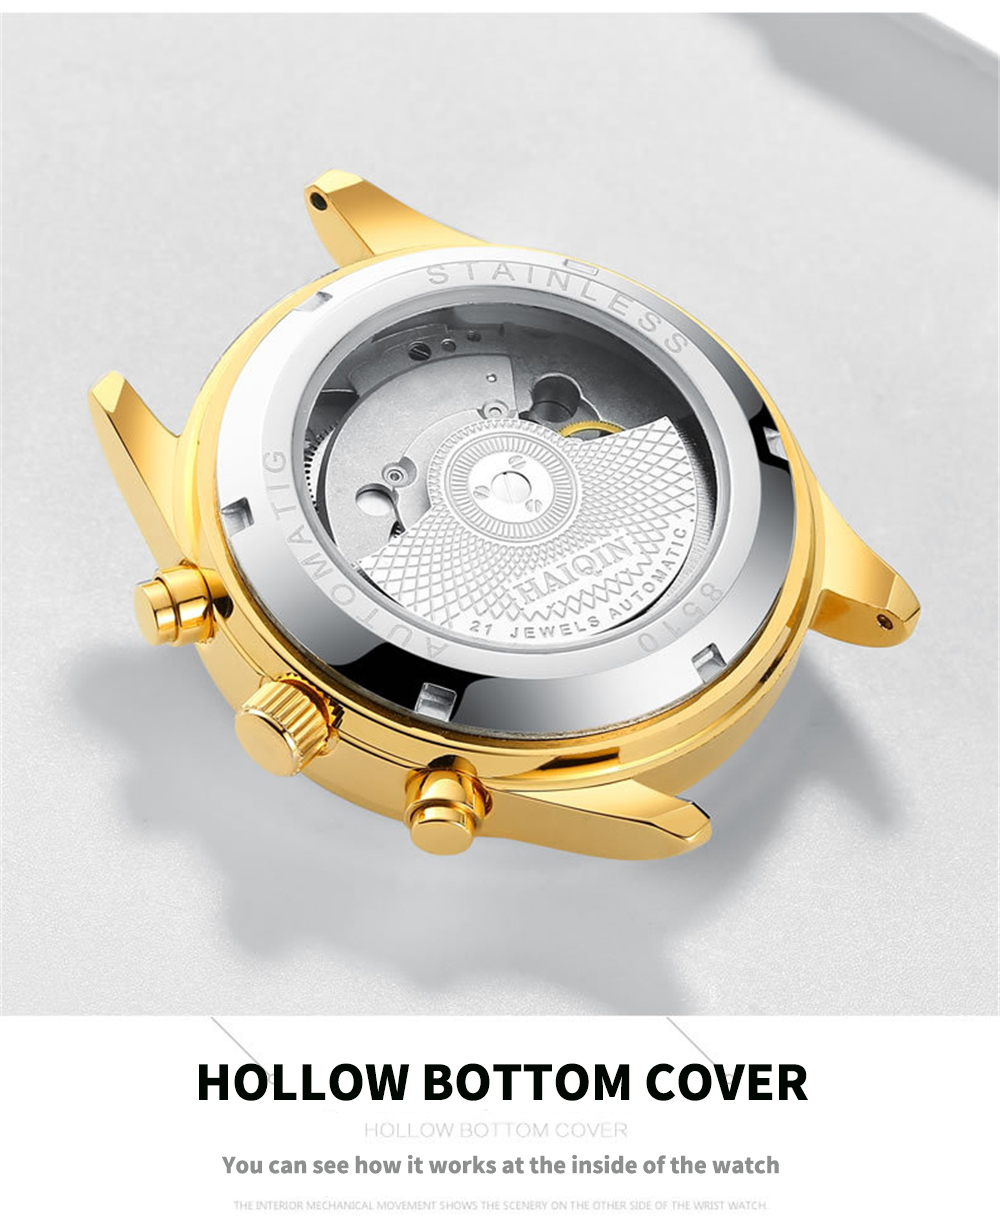 HTB1UtpiXOnrK1Rjy1Xcq6yeDVXa7 HAIQIN Men's watches Automatic mechanical Men Watches Business Watch men top brand luxury Military Waterproof Tourbillon Clock